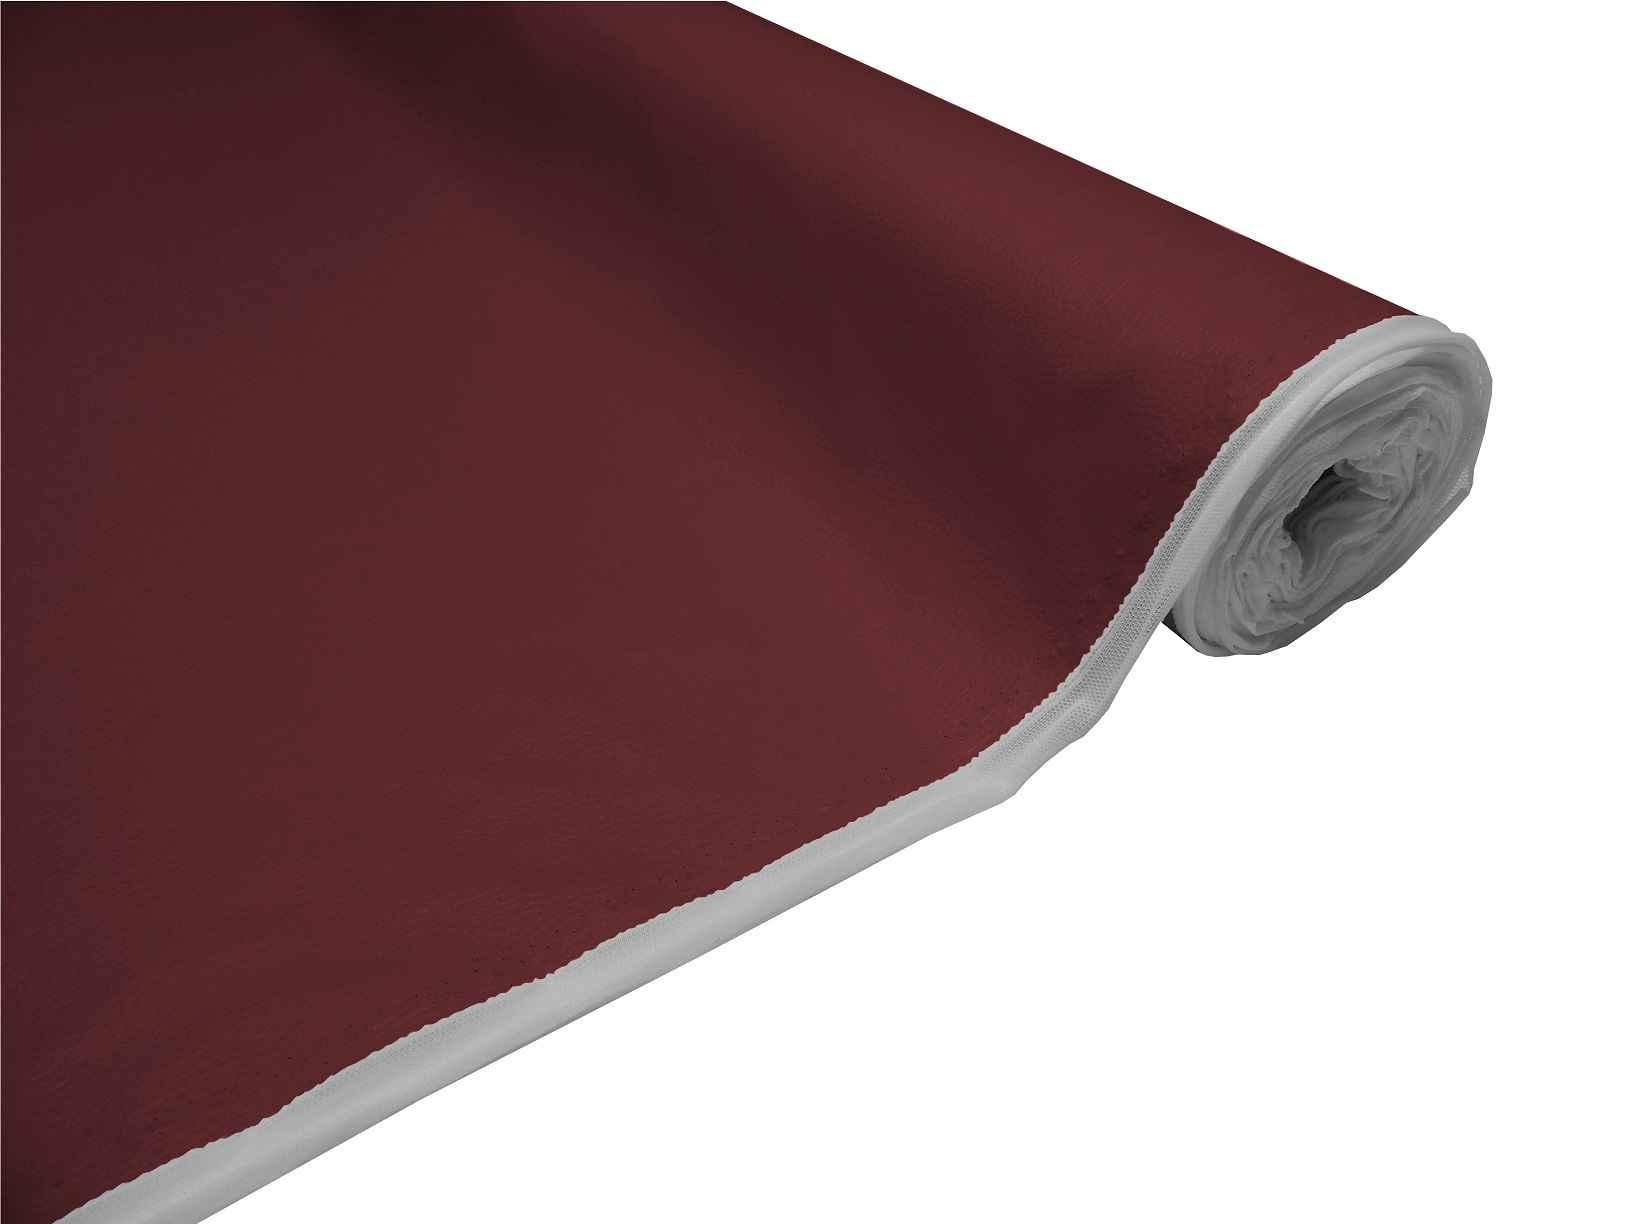 kunstleder stoff kentucky 140cm breit weinrot online kaufen. Black Bedroom Furniture Sets. Home Design Ideas